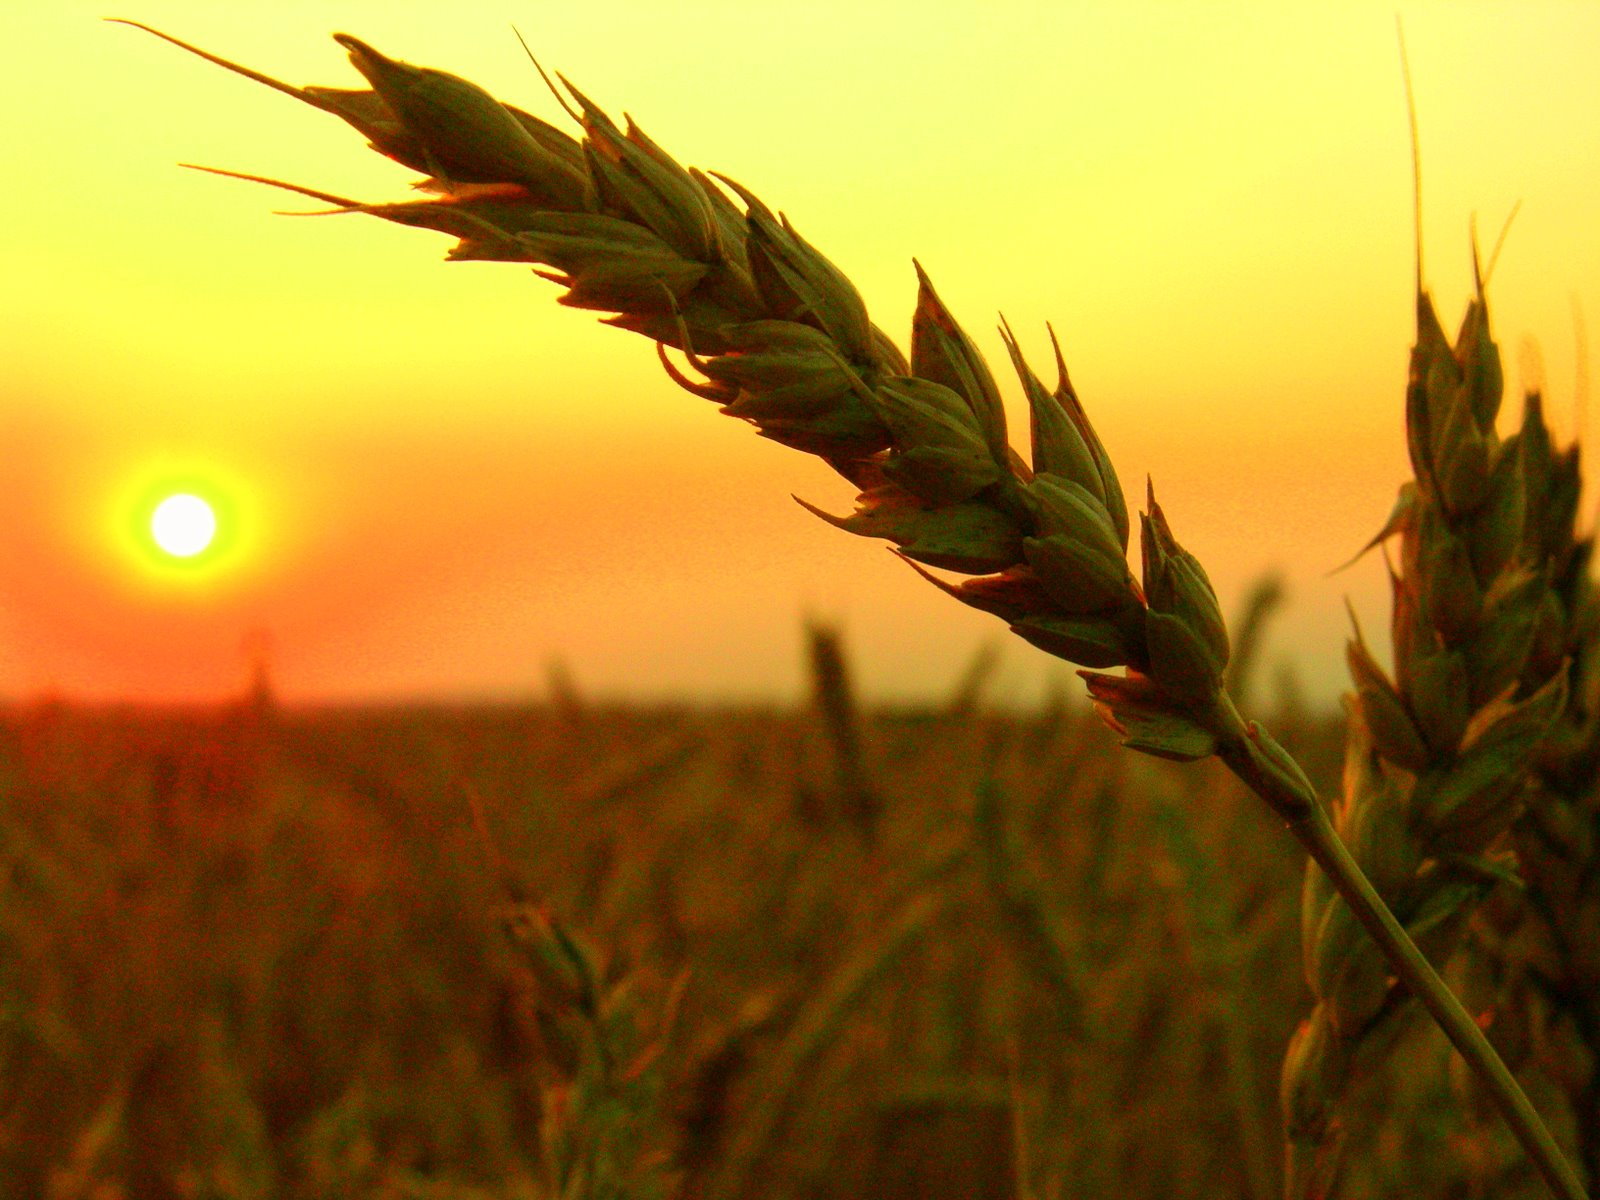 wheat-field-harvest-sunset.jpg